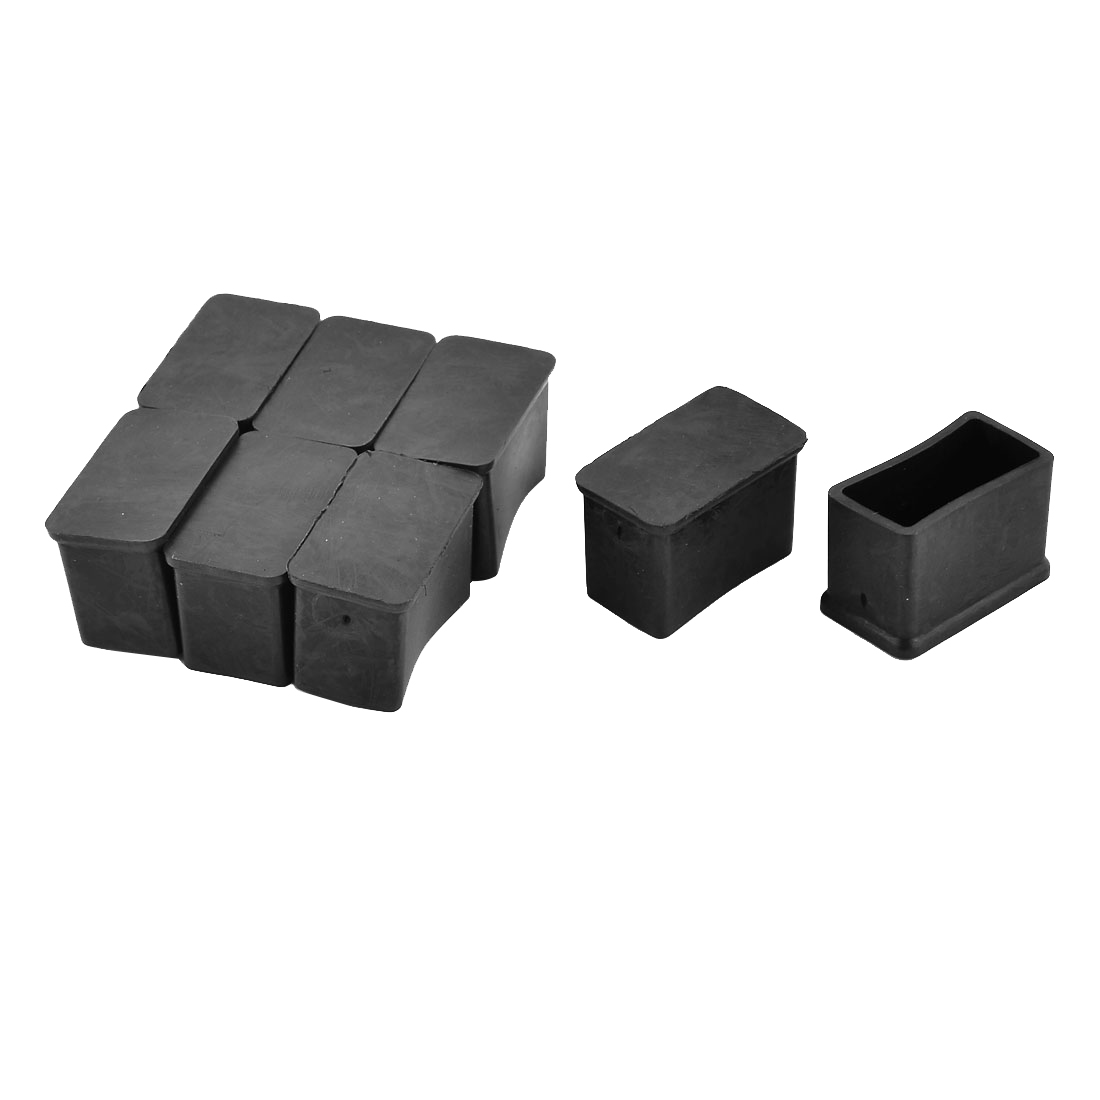 30mm x 15mm Rectangle Shaped Furniture Foot Leg Rubber End Cap Cover Black 8pcs